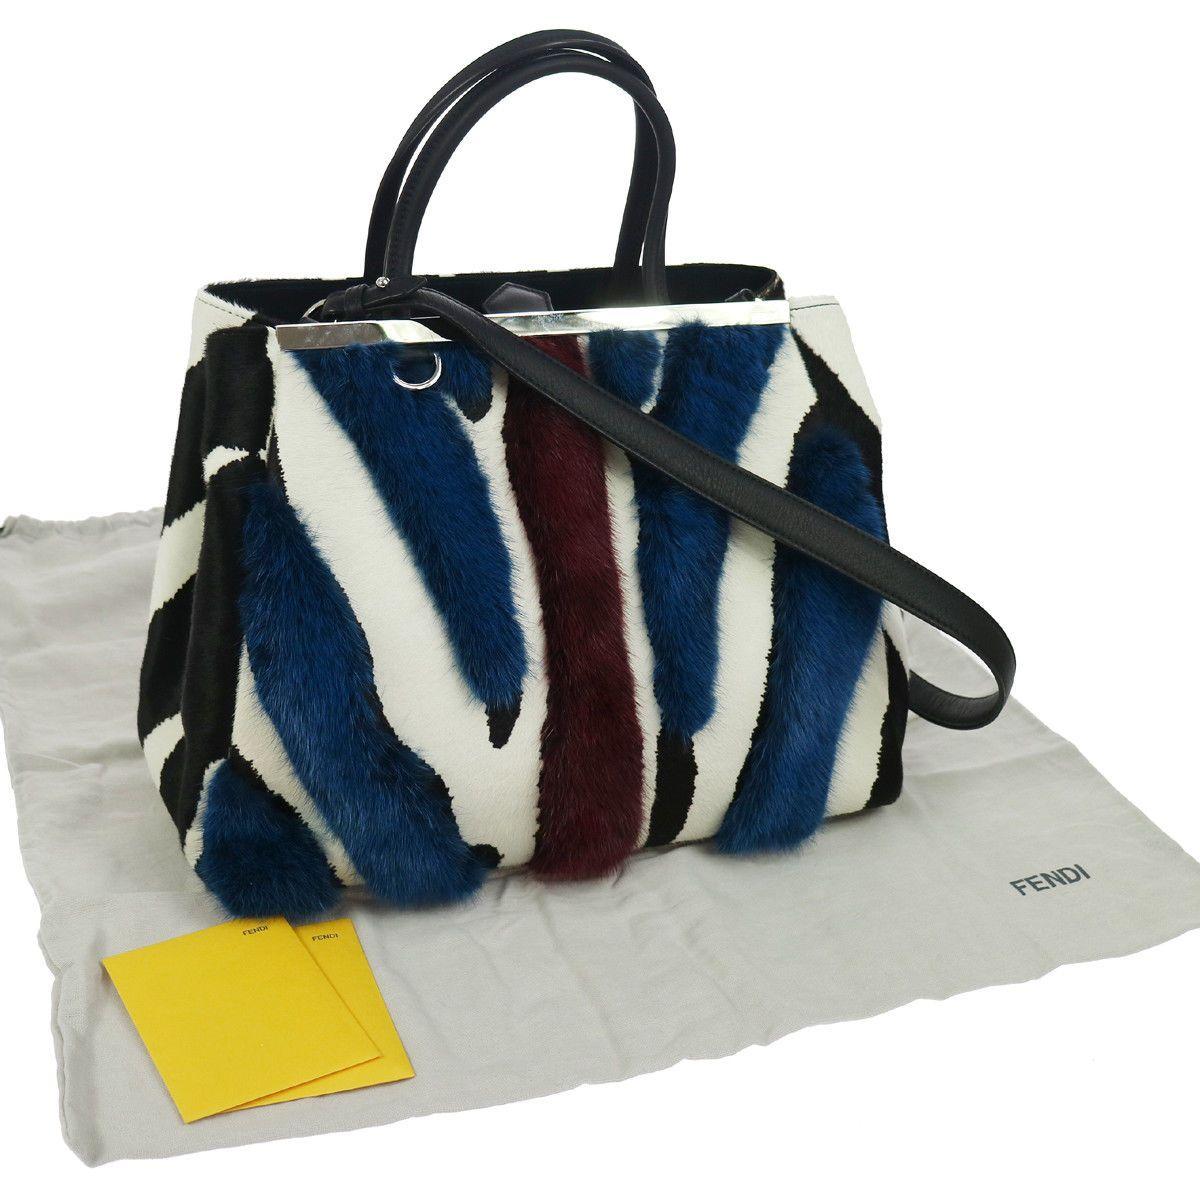 ... Authentic FENDI Shopping 2 Jours 2way Hand Bag Haircalf EXCELLENT  NR10824 official photos 8a3db ac2df  AUTHENTIC FENDI PEEKABOO MINI ... 3b191f50e5